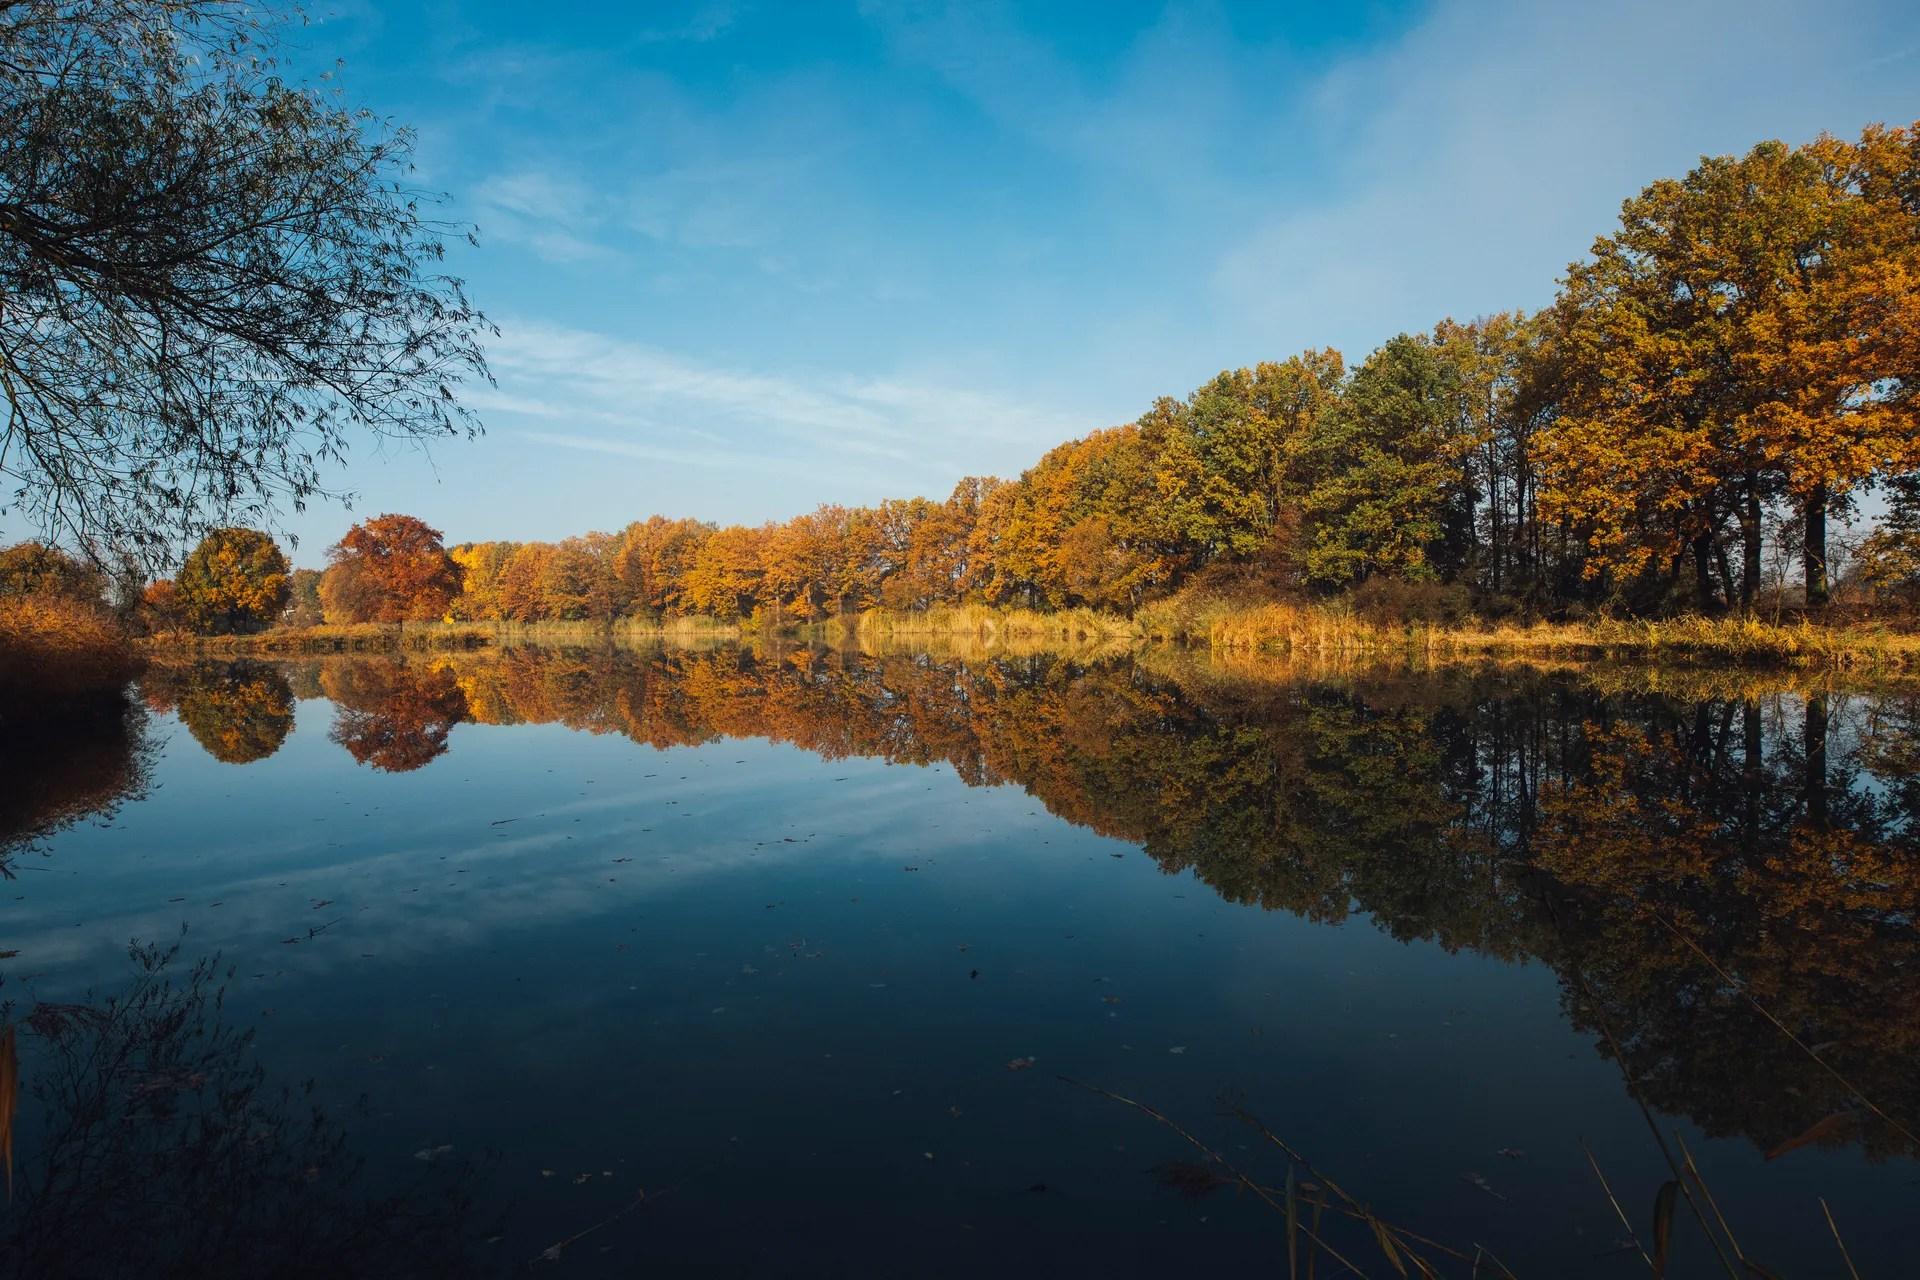 Fall Fantasy Wallpapers Coco As Marilyn Monroe Widescreen Wallpaper Wide